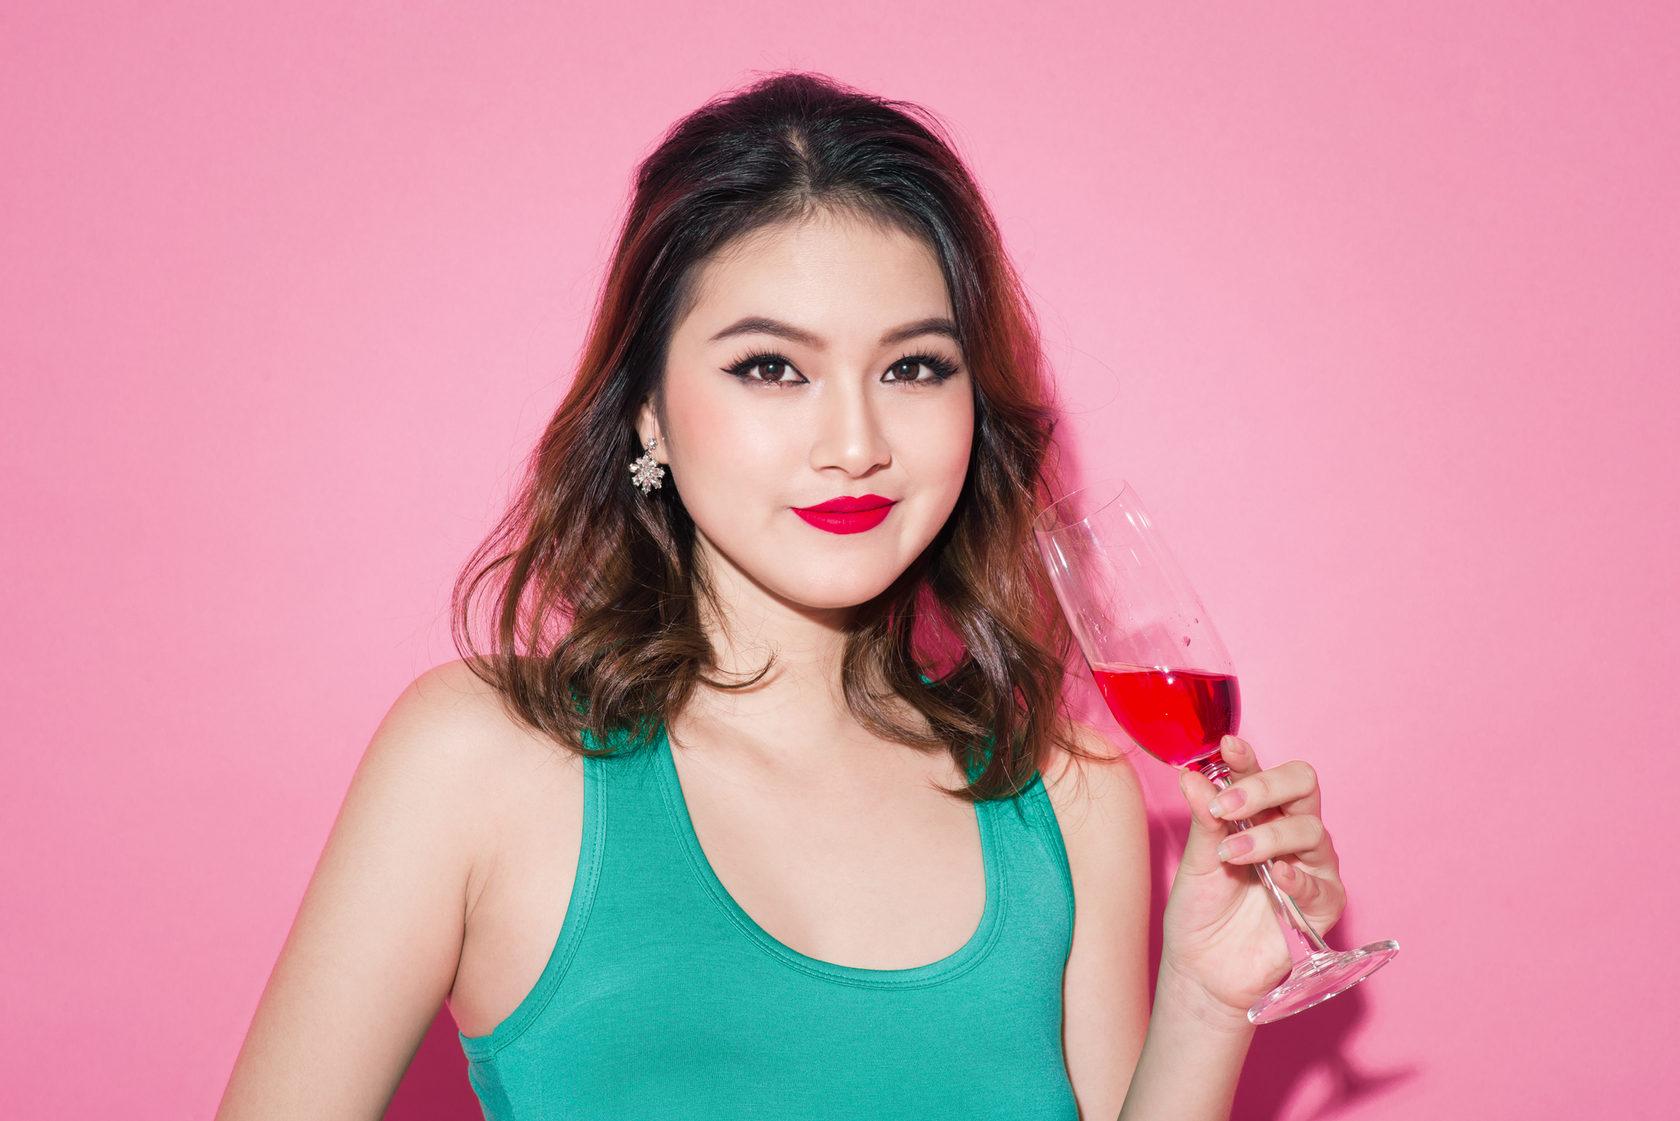 philippian girl